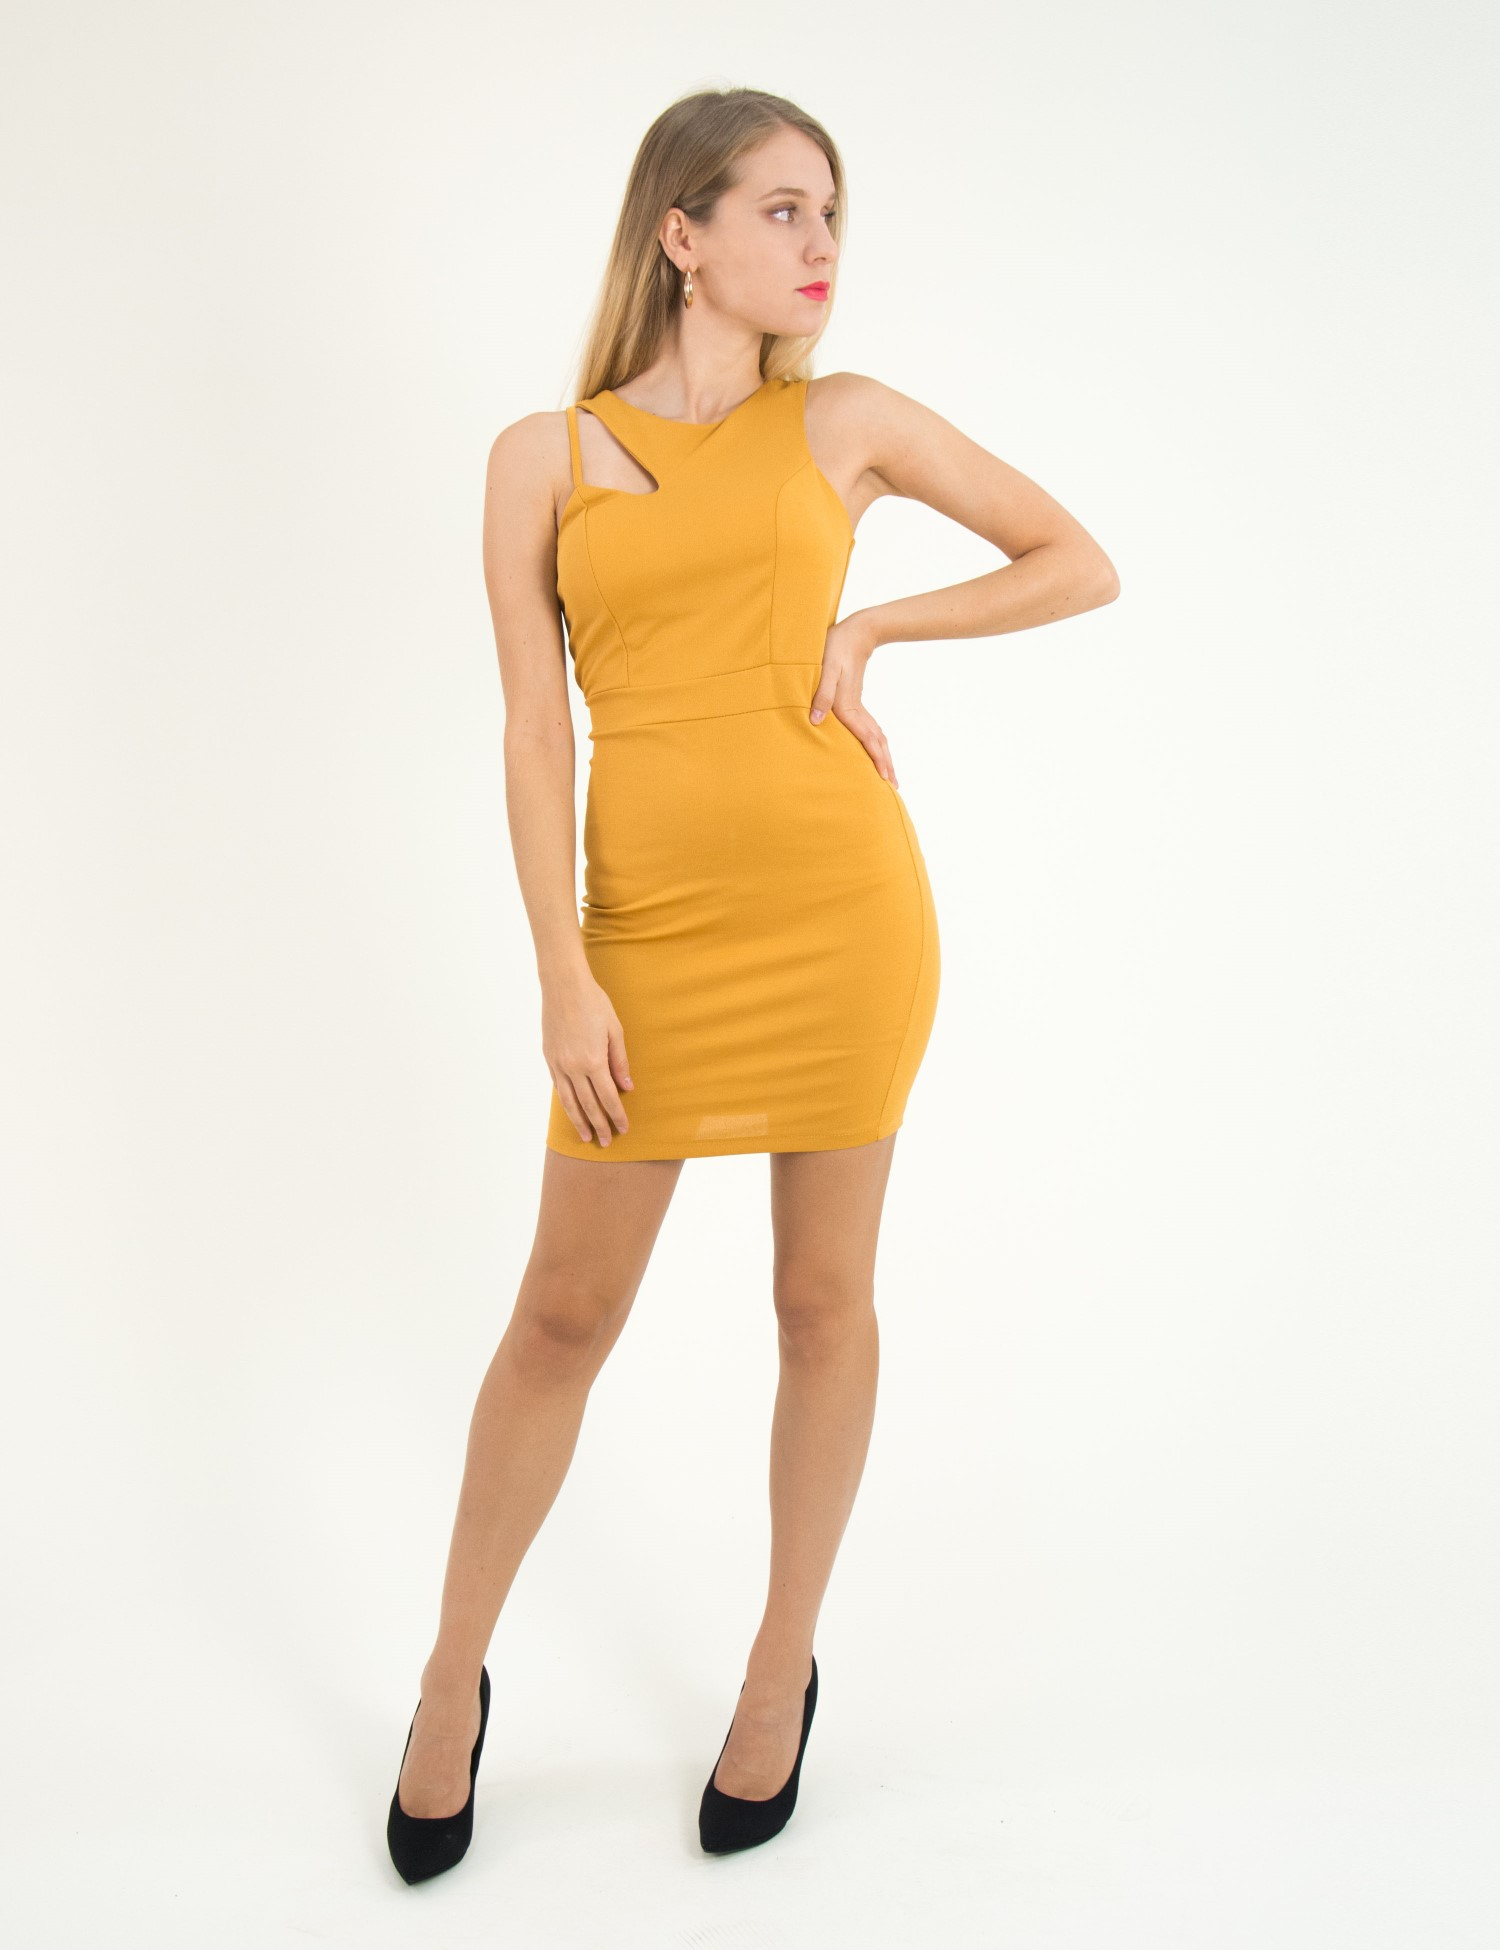 fccd3c33e99 Γυναικείο ώχρα αμάνικο φόρεμα μονόχρωμο άνοιγμα 3783